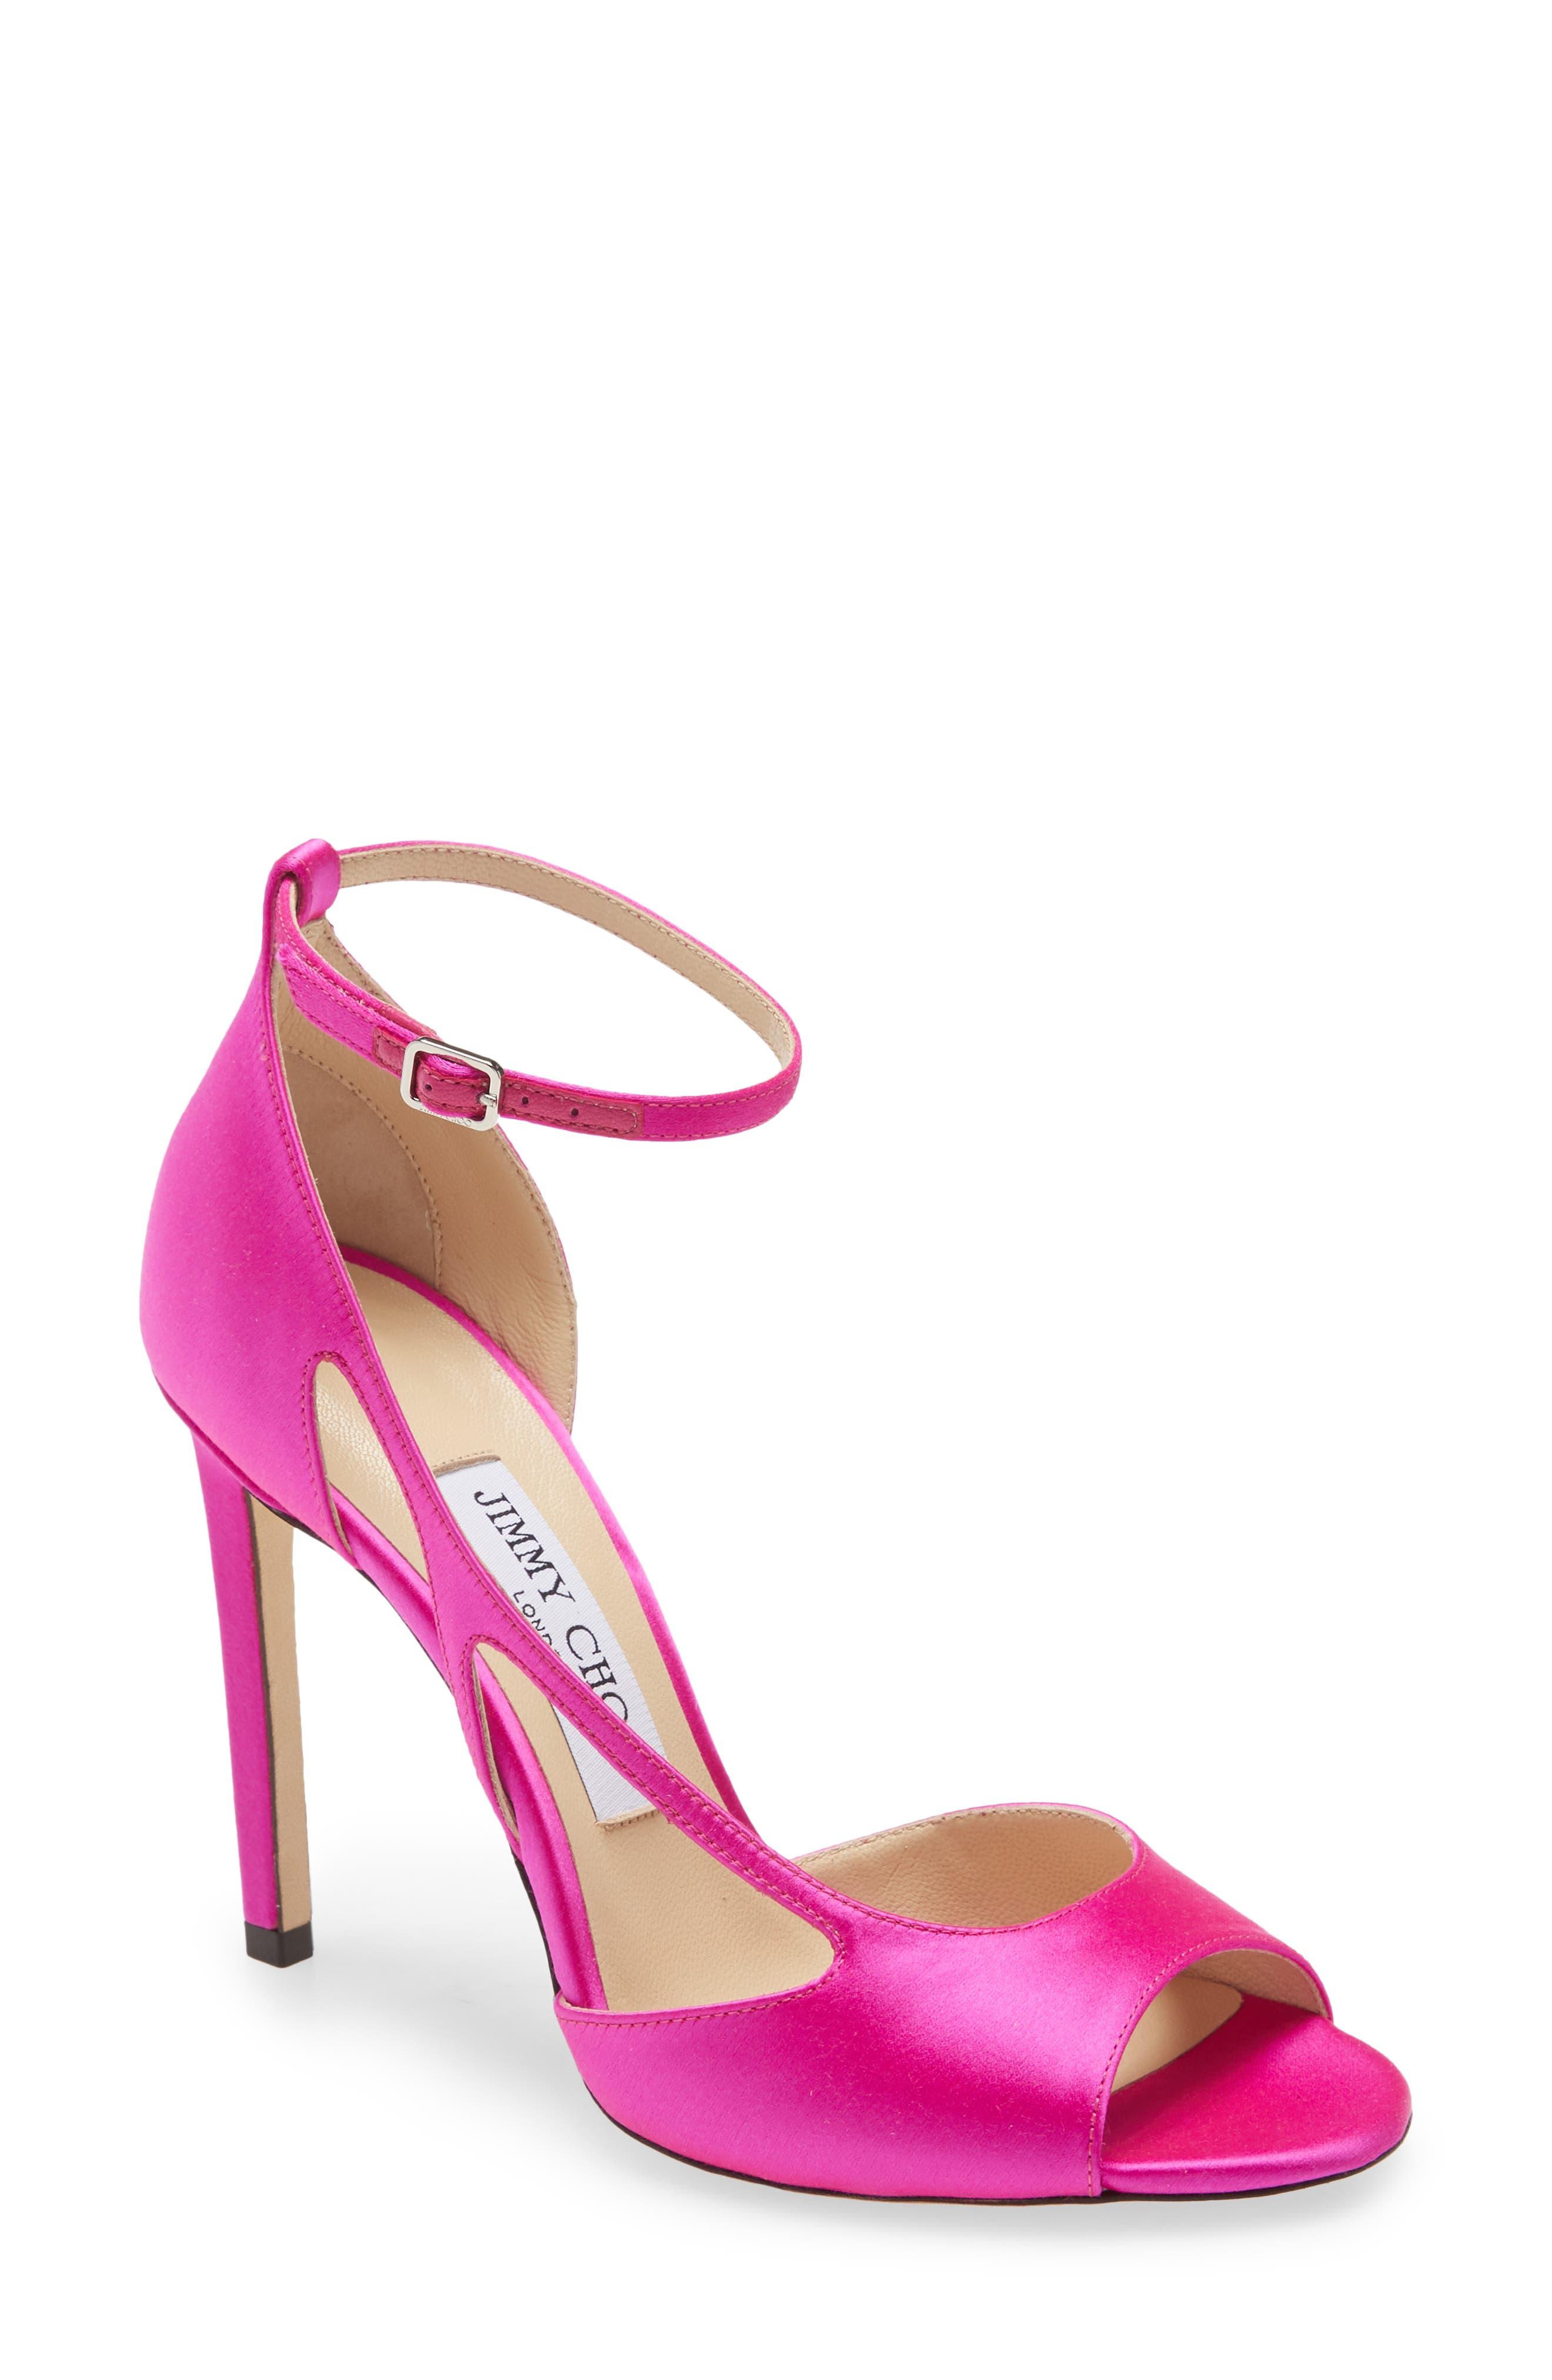 jimmy choo shoes pink